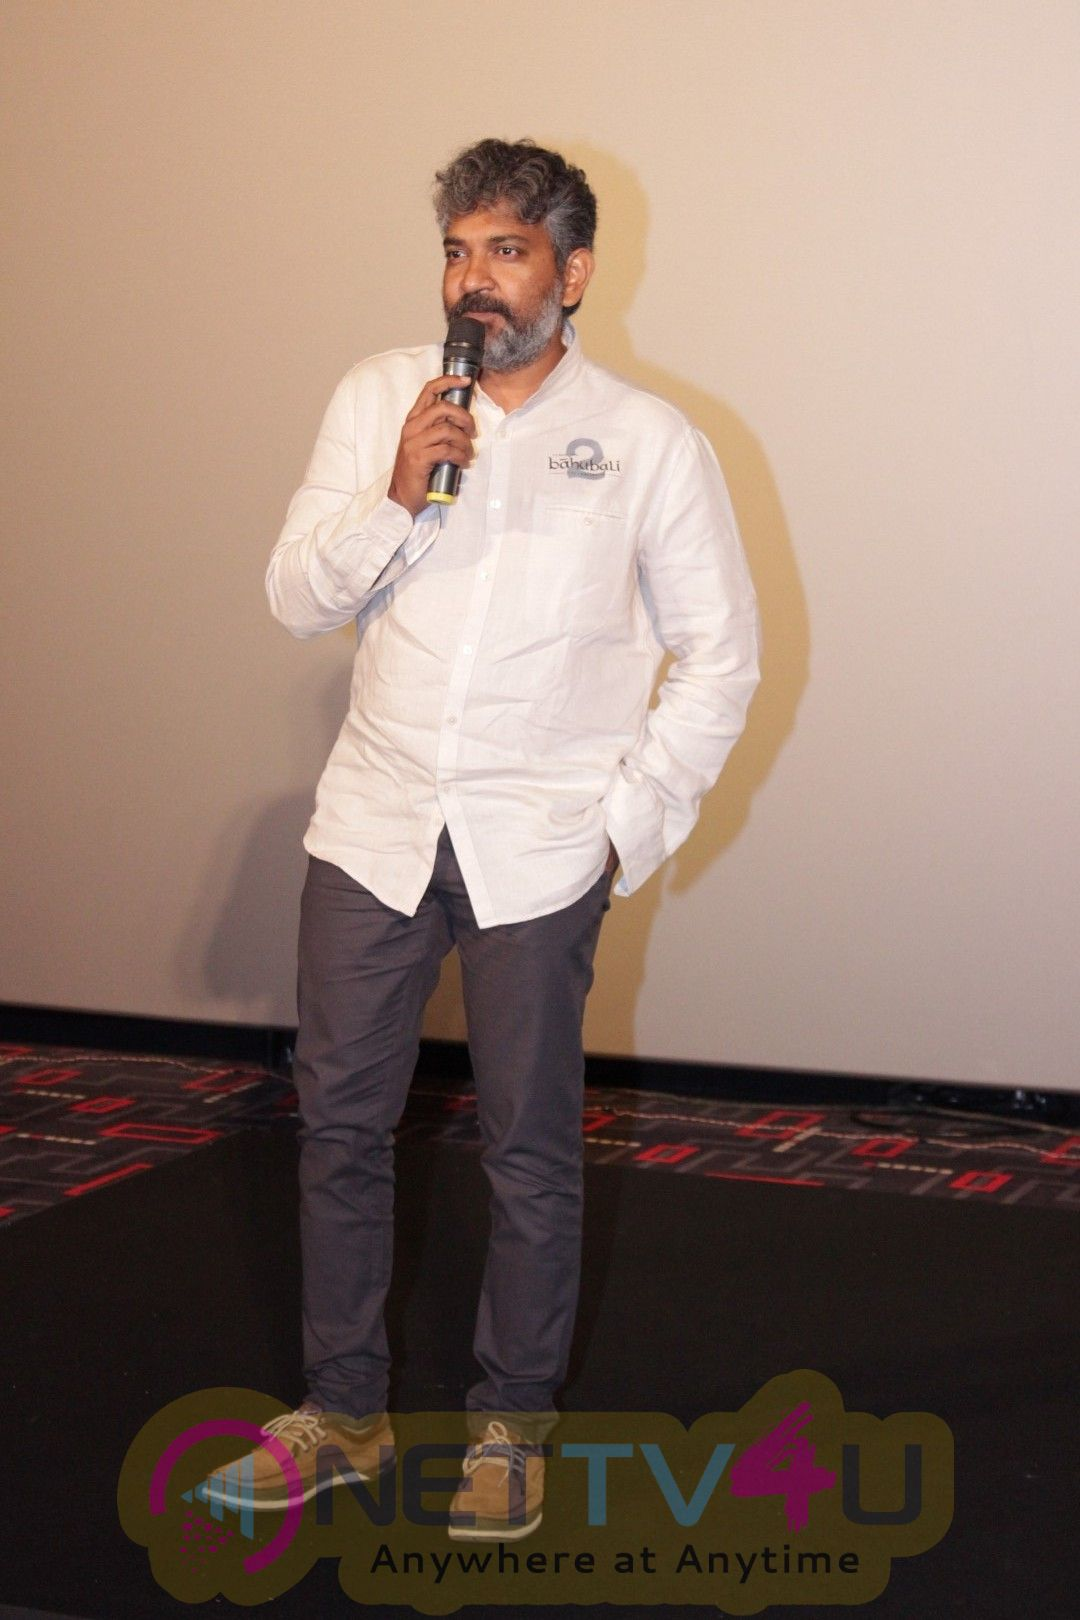 S.S Rajamouli At IMAX Madia Day Grand Pics